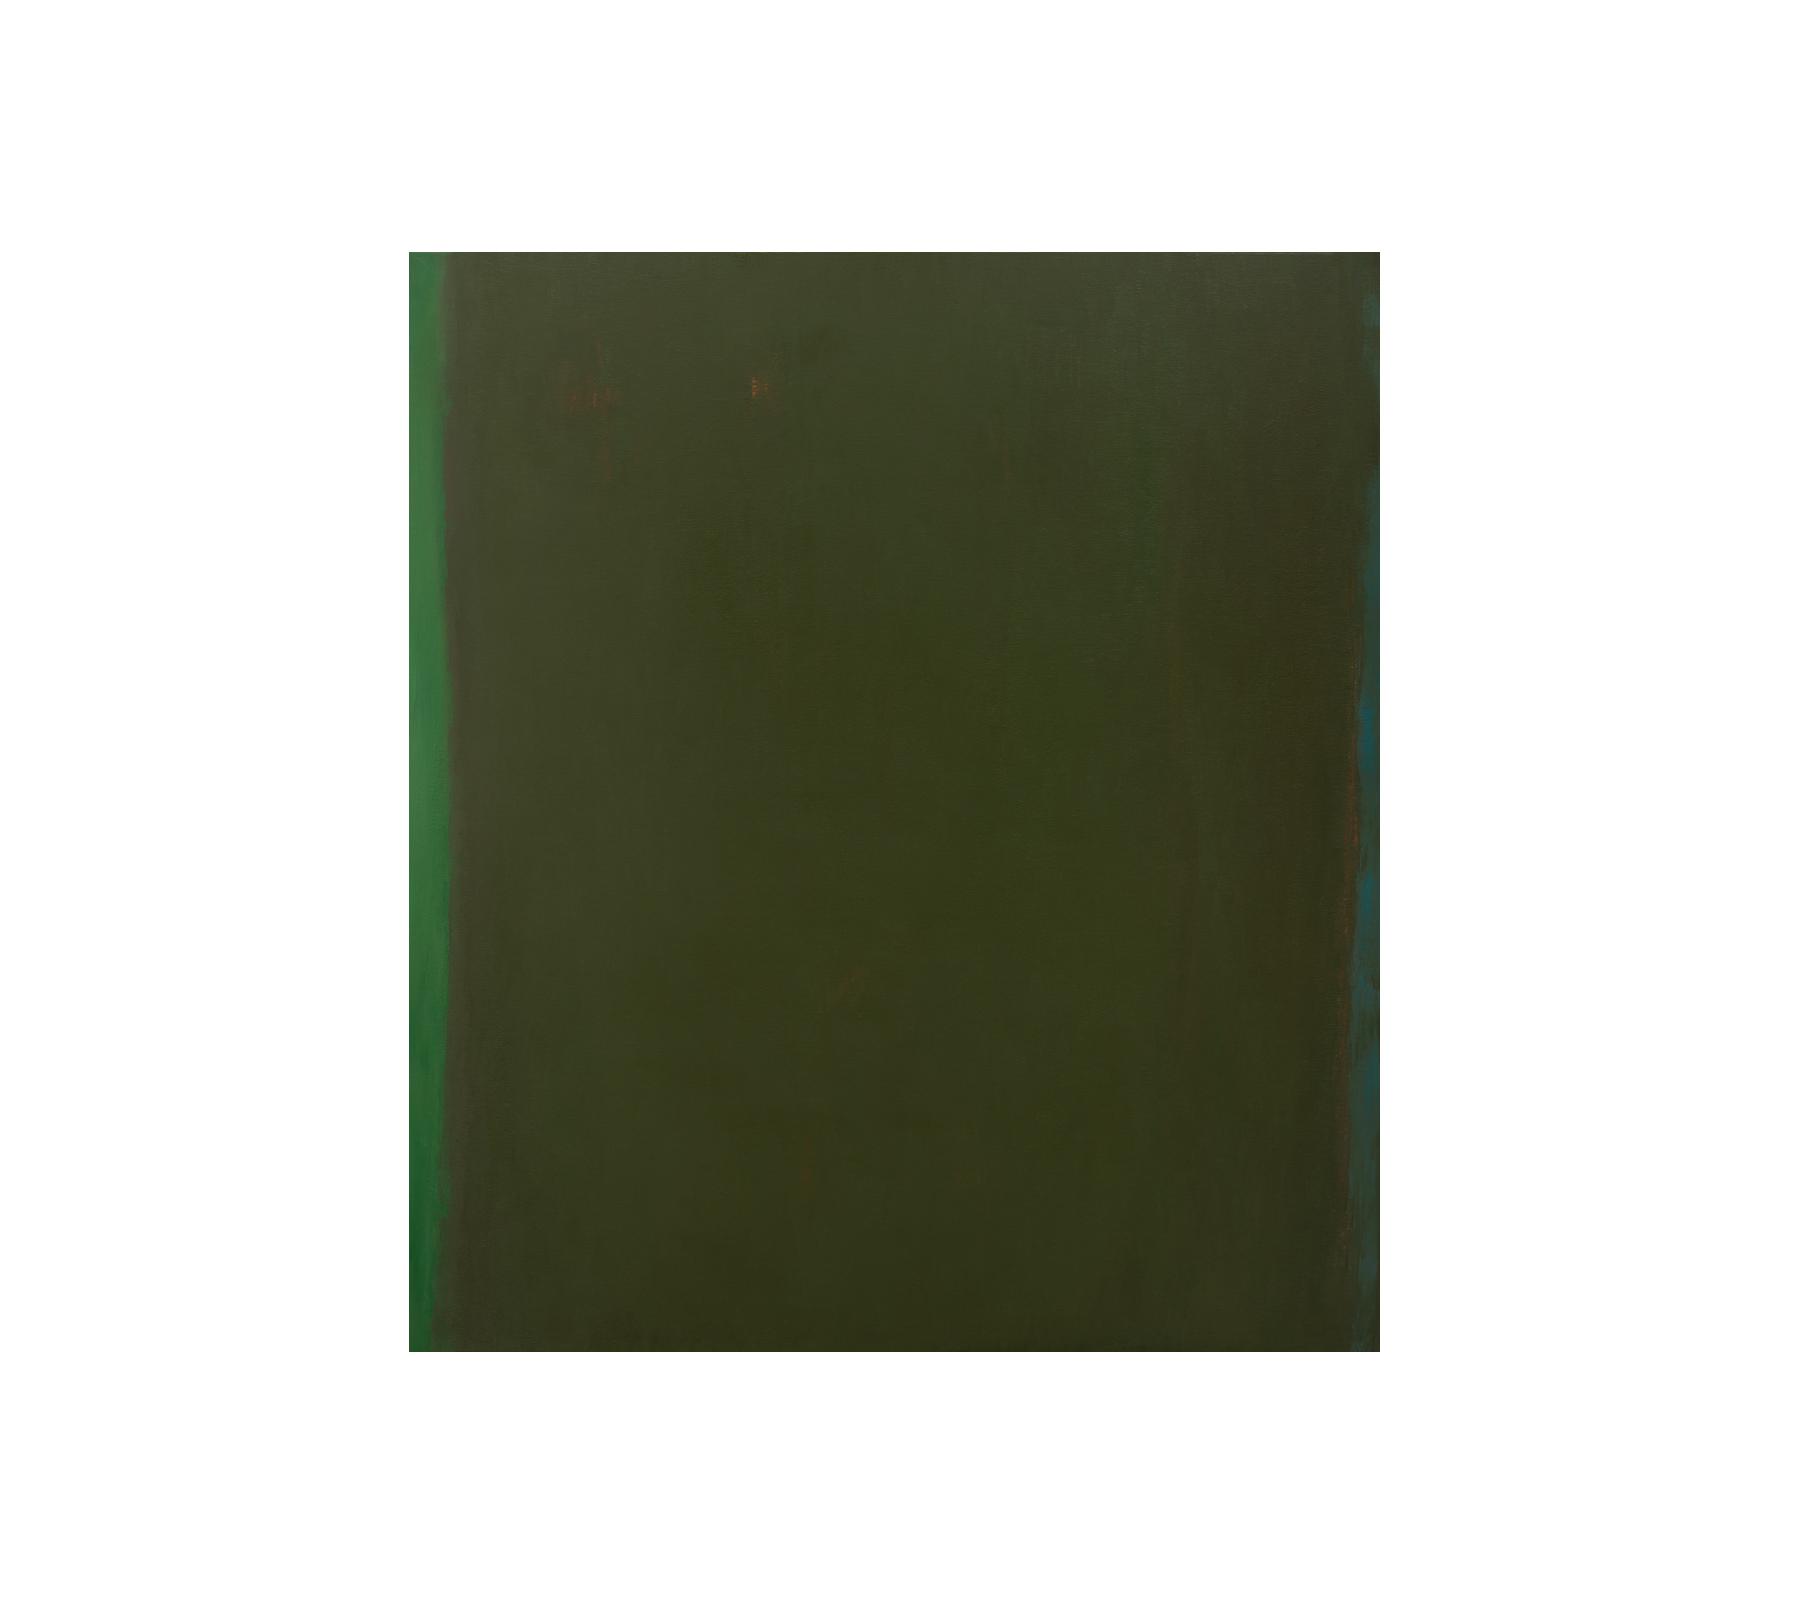 Untitled 2019 180x160cm